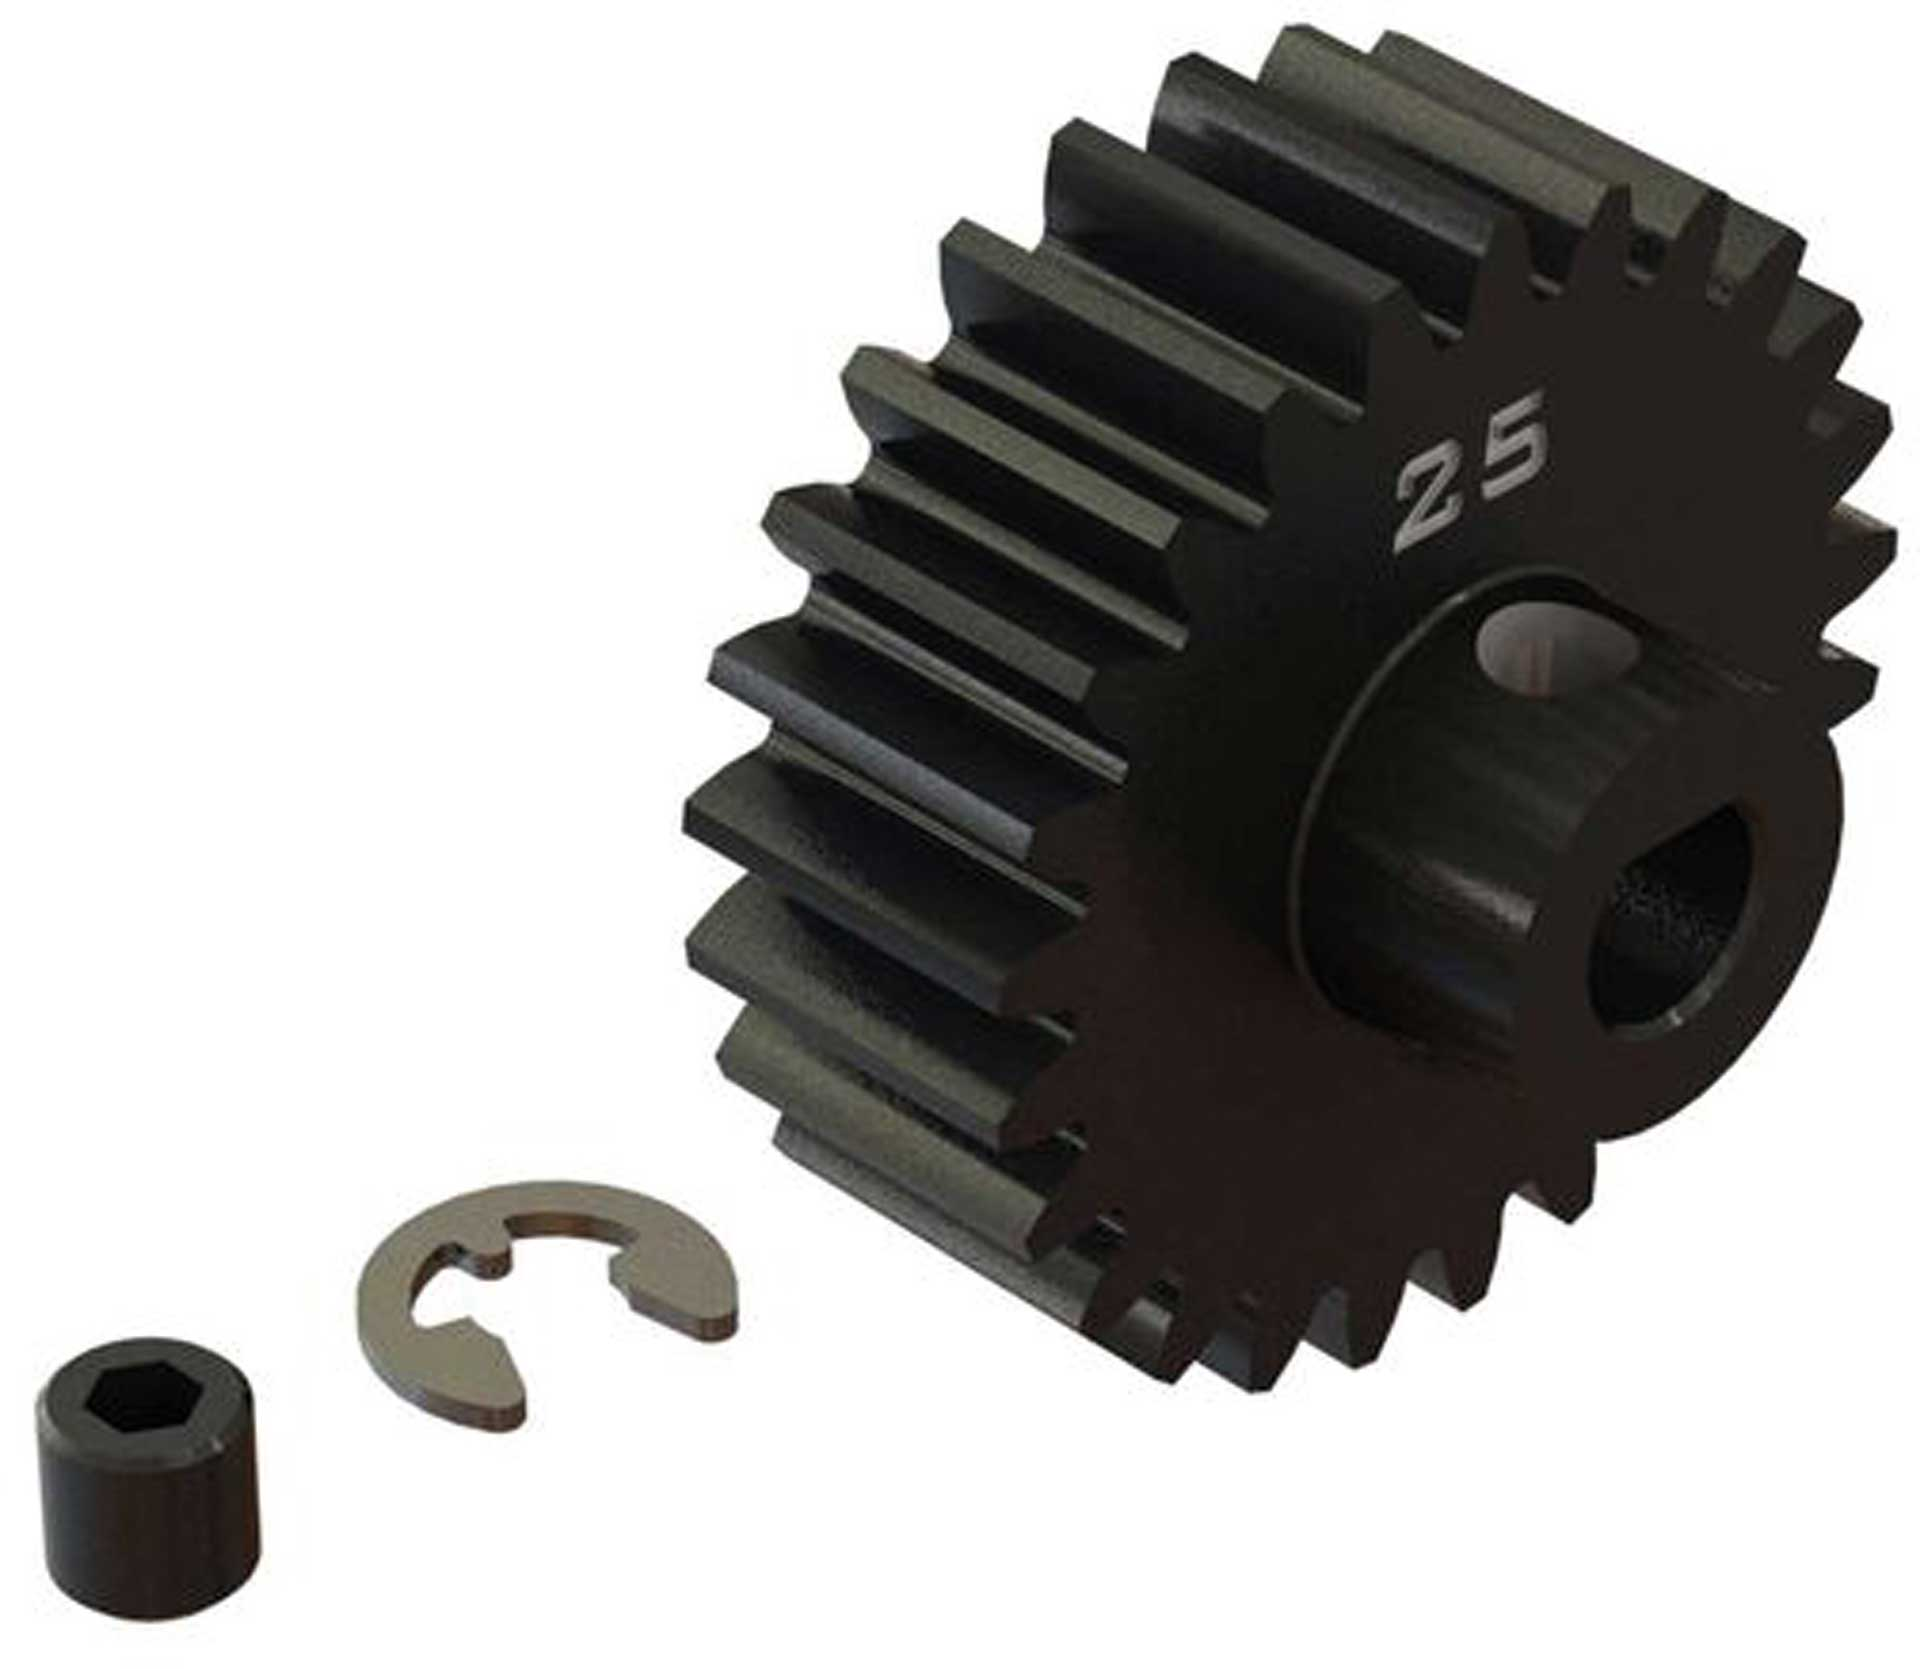 Arrma 25T HD Mod1 Pinion Gear